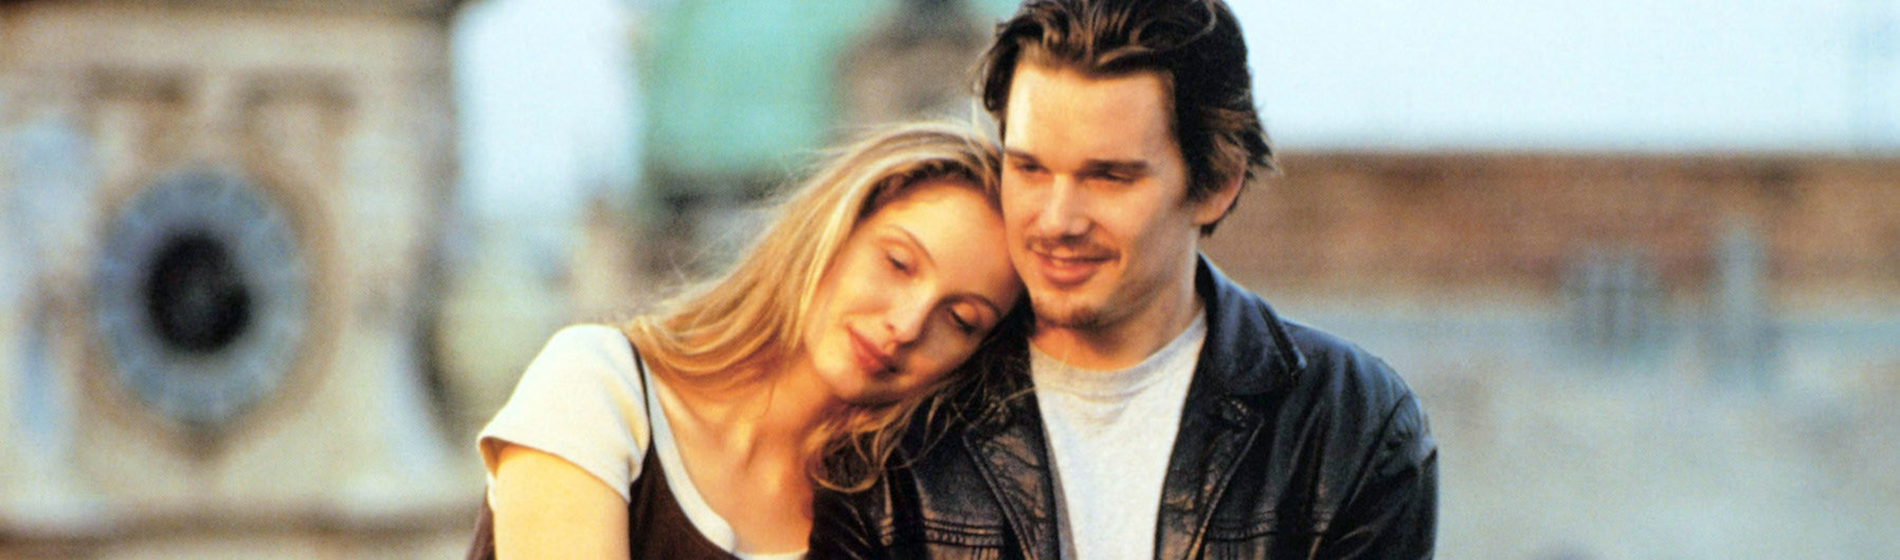 Julie Delpy leaning on Ethan Hawke's shoulder in Before Sunrise